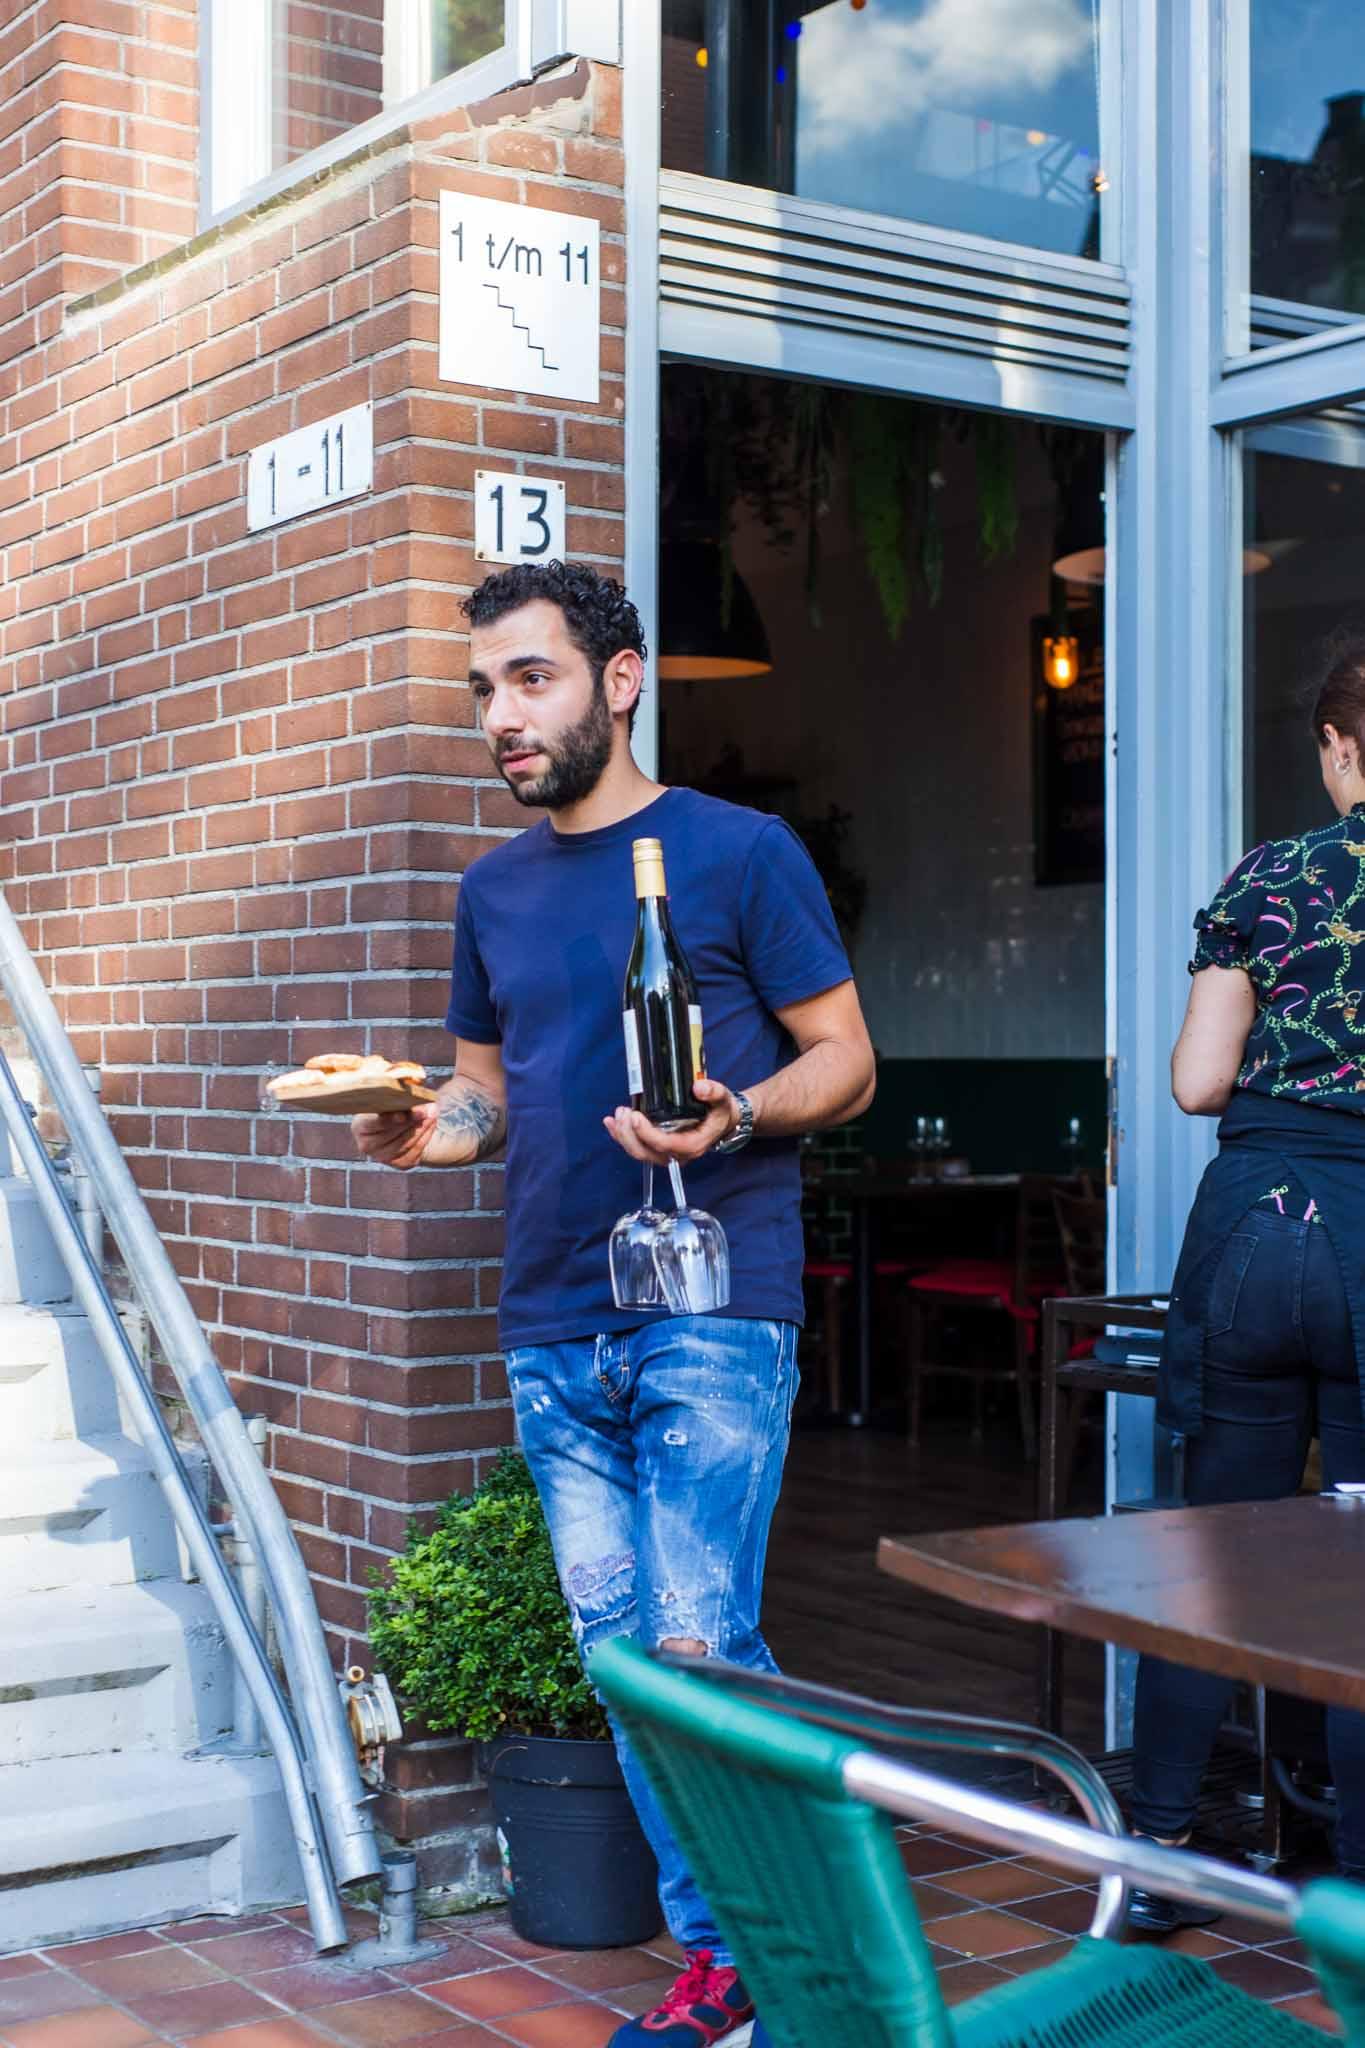 Waiter going outside an Italian restaurant to serve a dish